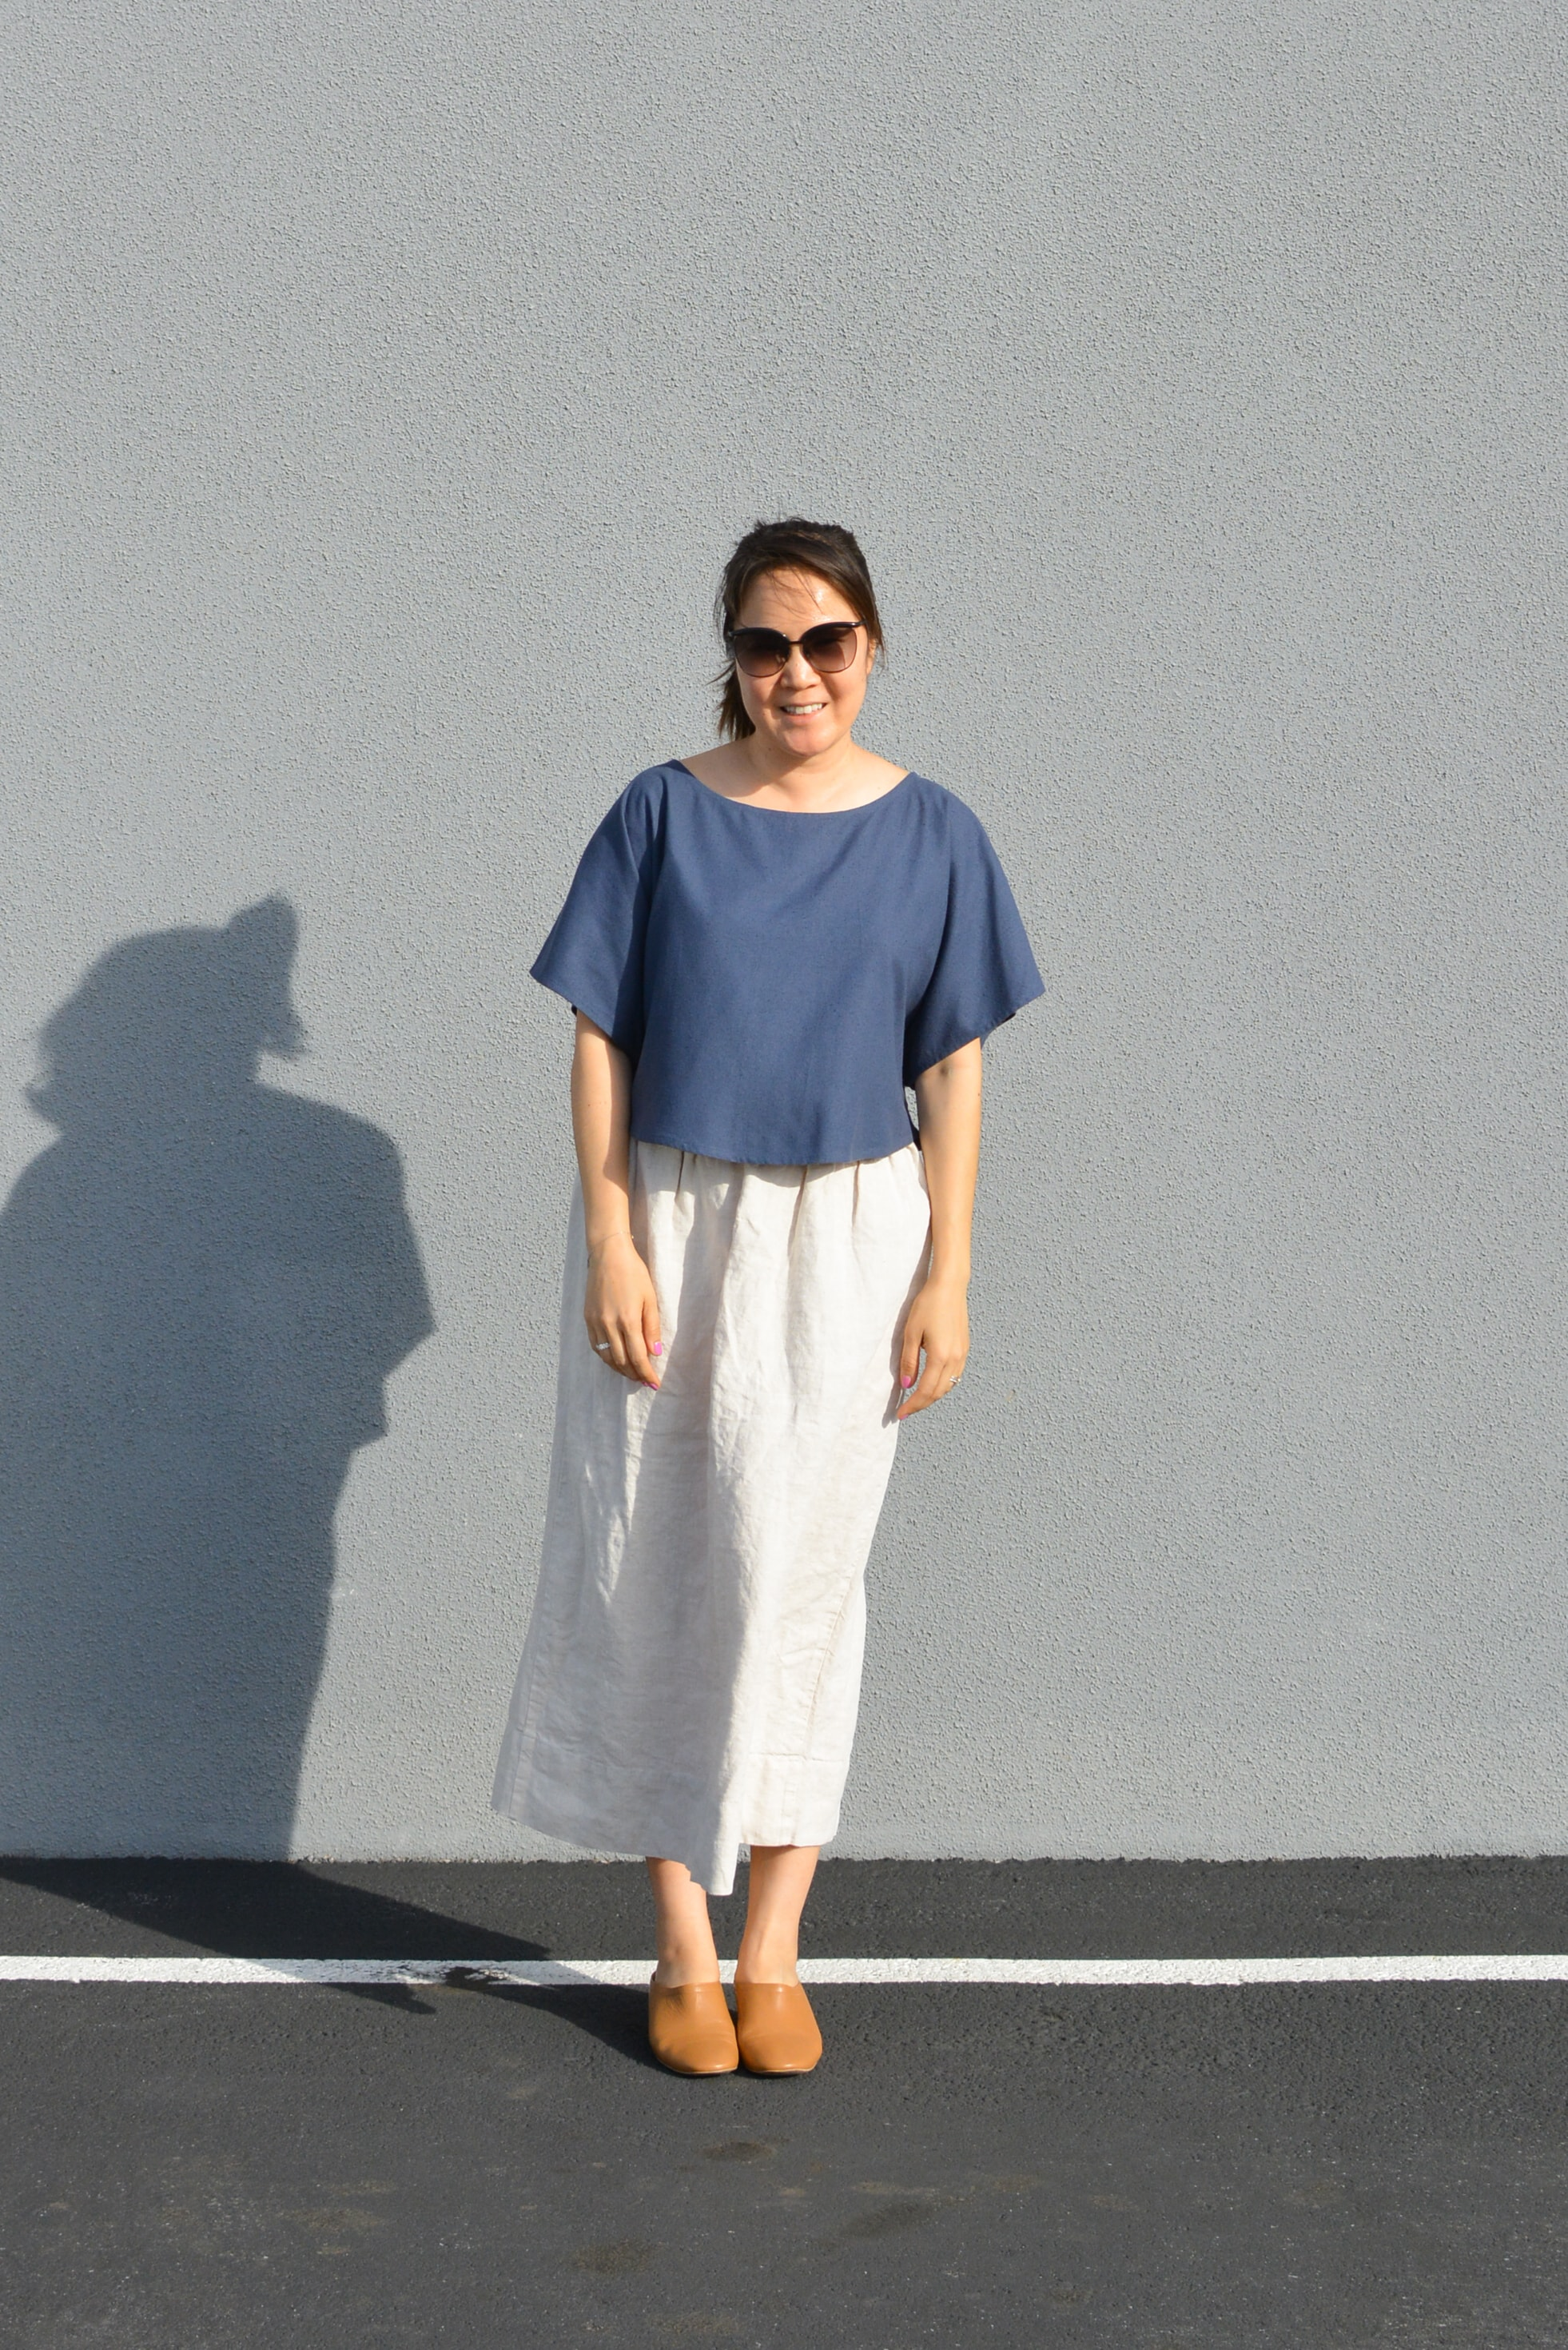 Elizabeth Suzann Review Linen Bel Skirt (1 of 6)-min.jpg